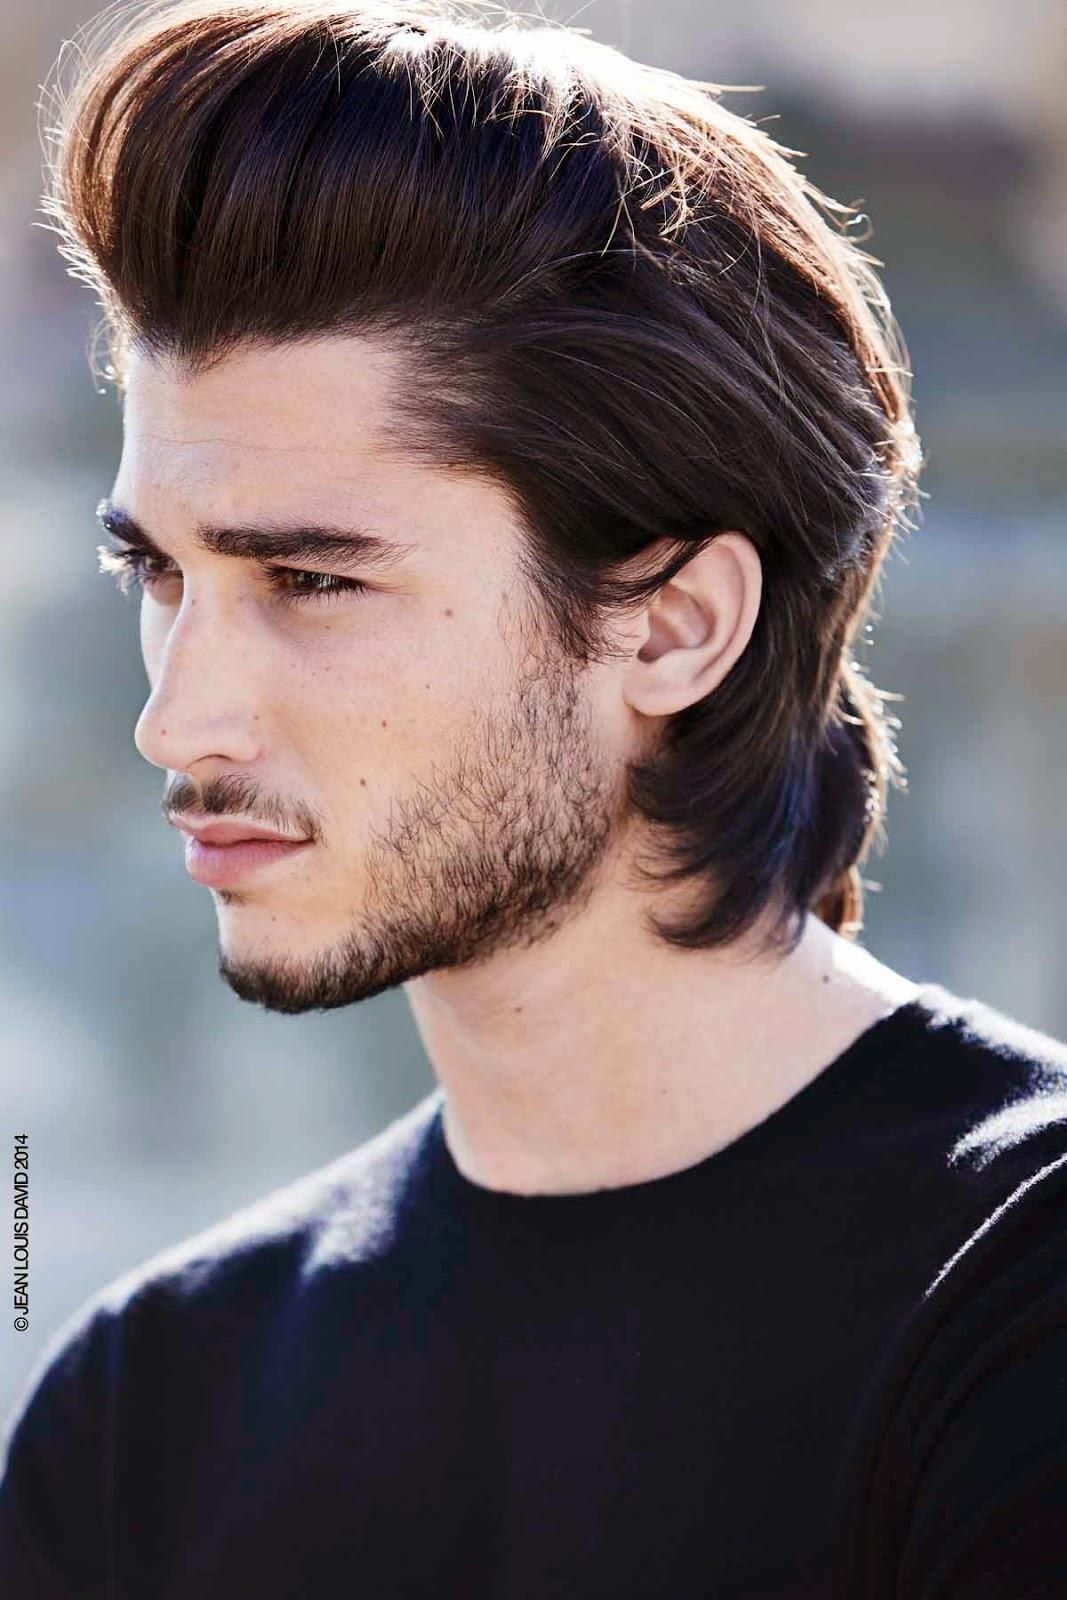 Kapsels En Haarverzorging Trendy Mannenkapsels Herfst 2014 Winter 2015 Kapsels Voor Mannen